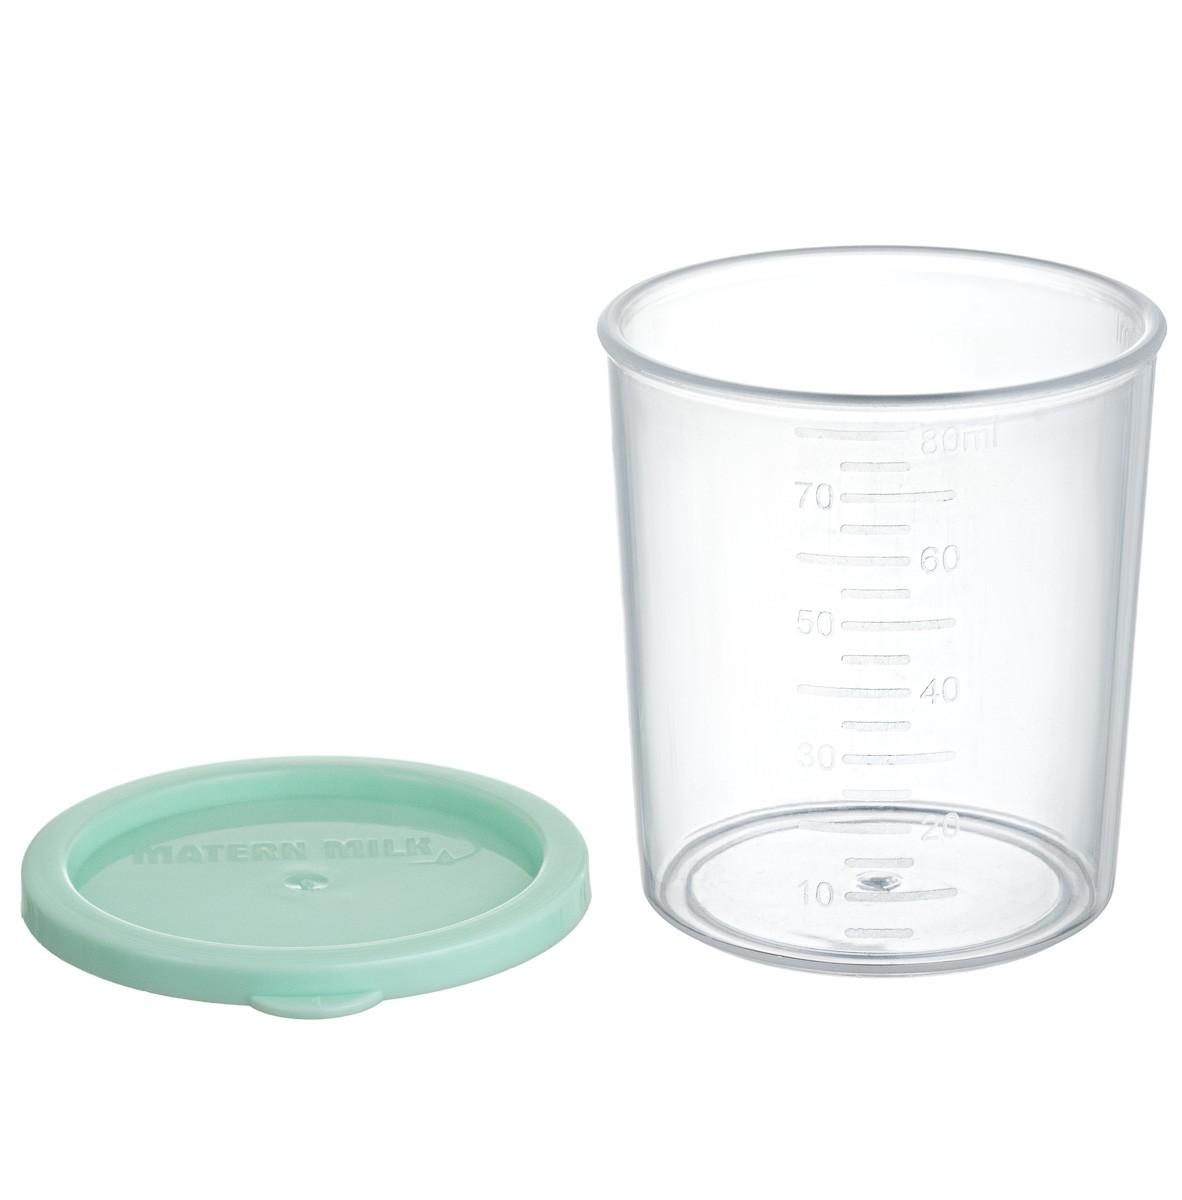 Kit 10  Copos Para Armazenamento de Leite Materno - 80 ml (a granel)  - Matern Milk